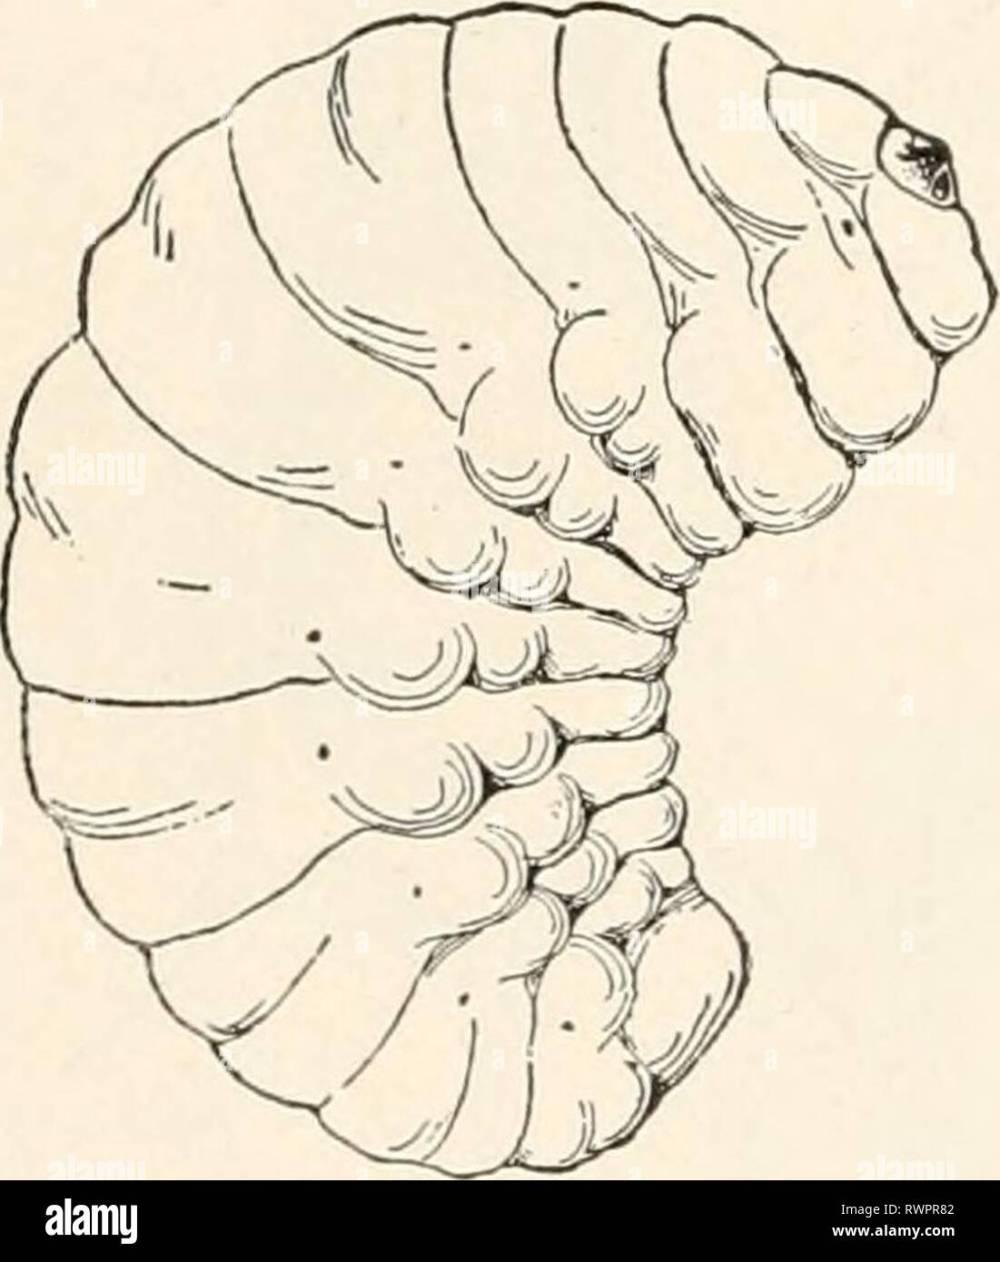 medium resolution of elementary entomology c1912 elementary entomology elementaryentomo00sand year c1912 a c